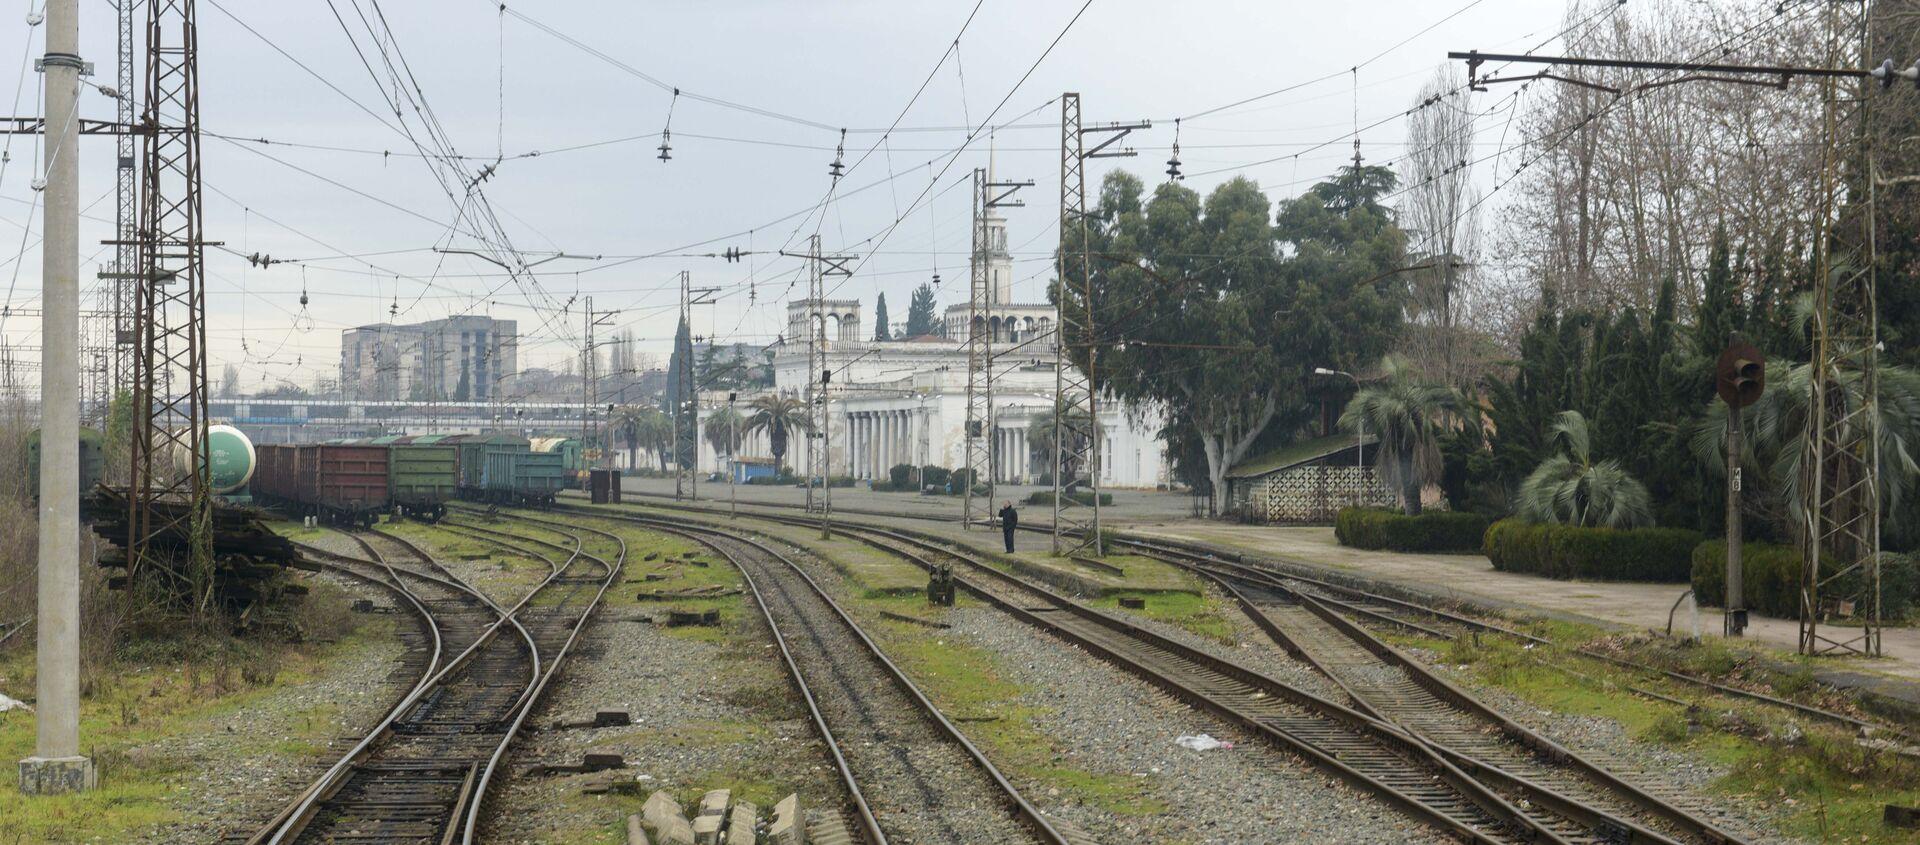 Железная дорога - Sputnik Абхазия, 1920, 31.07.2021